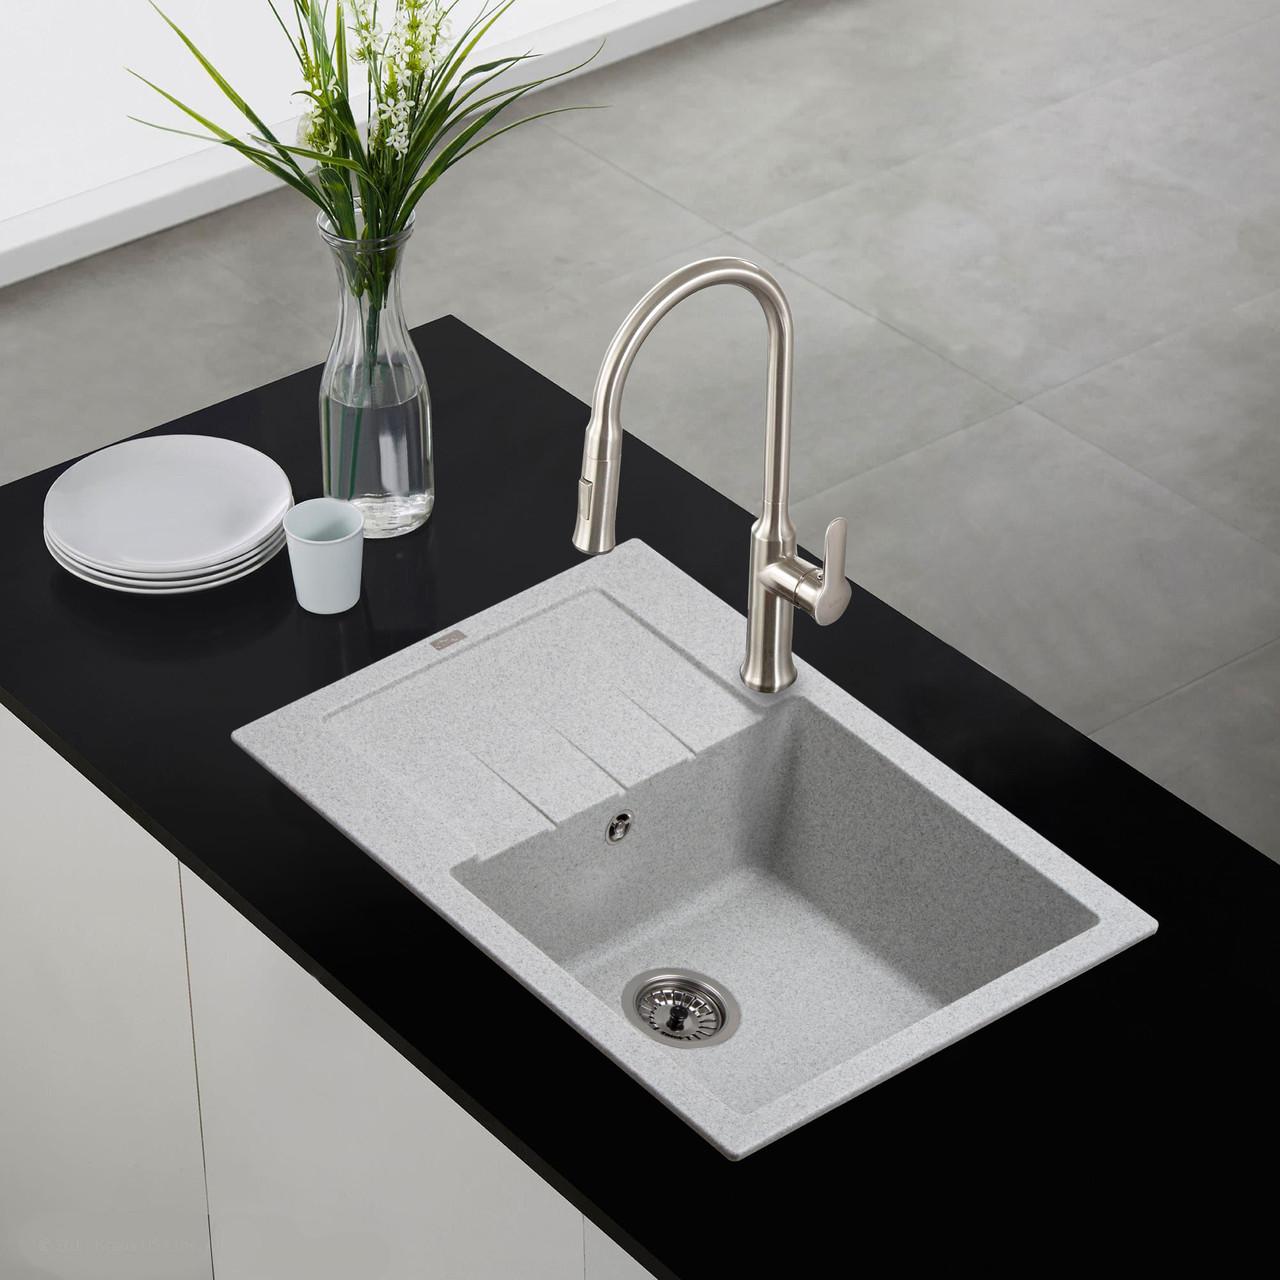 Кам'яна мийка Ventolux SILVIA (GRAY GRANIT) 620x500x200